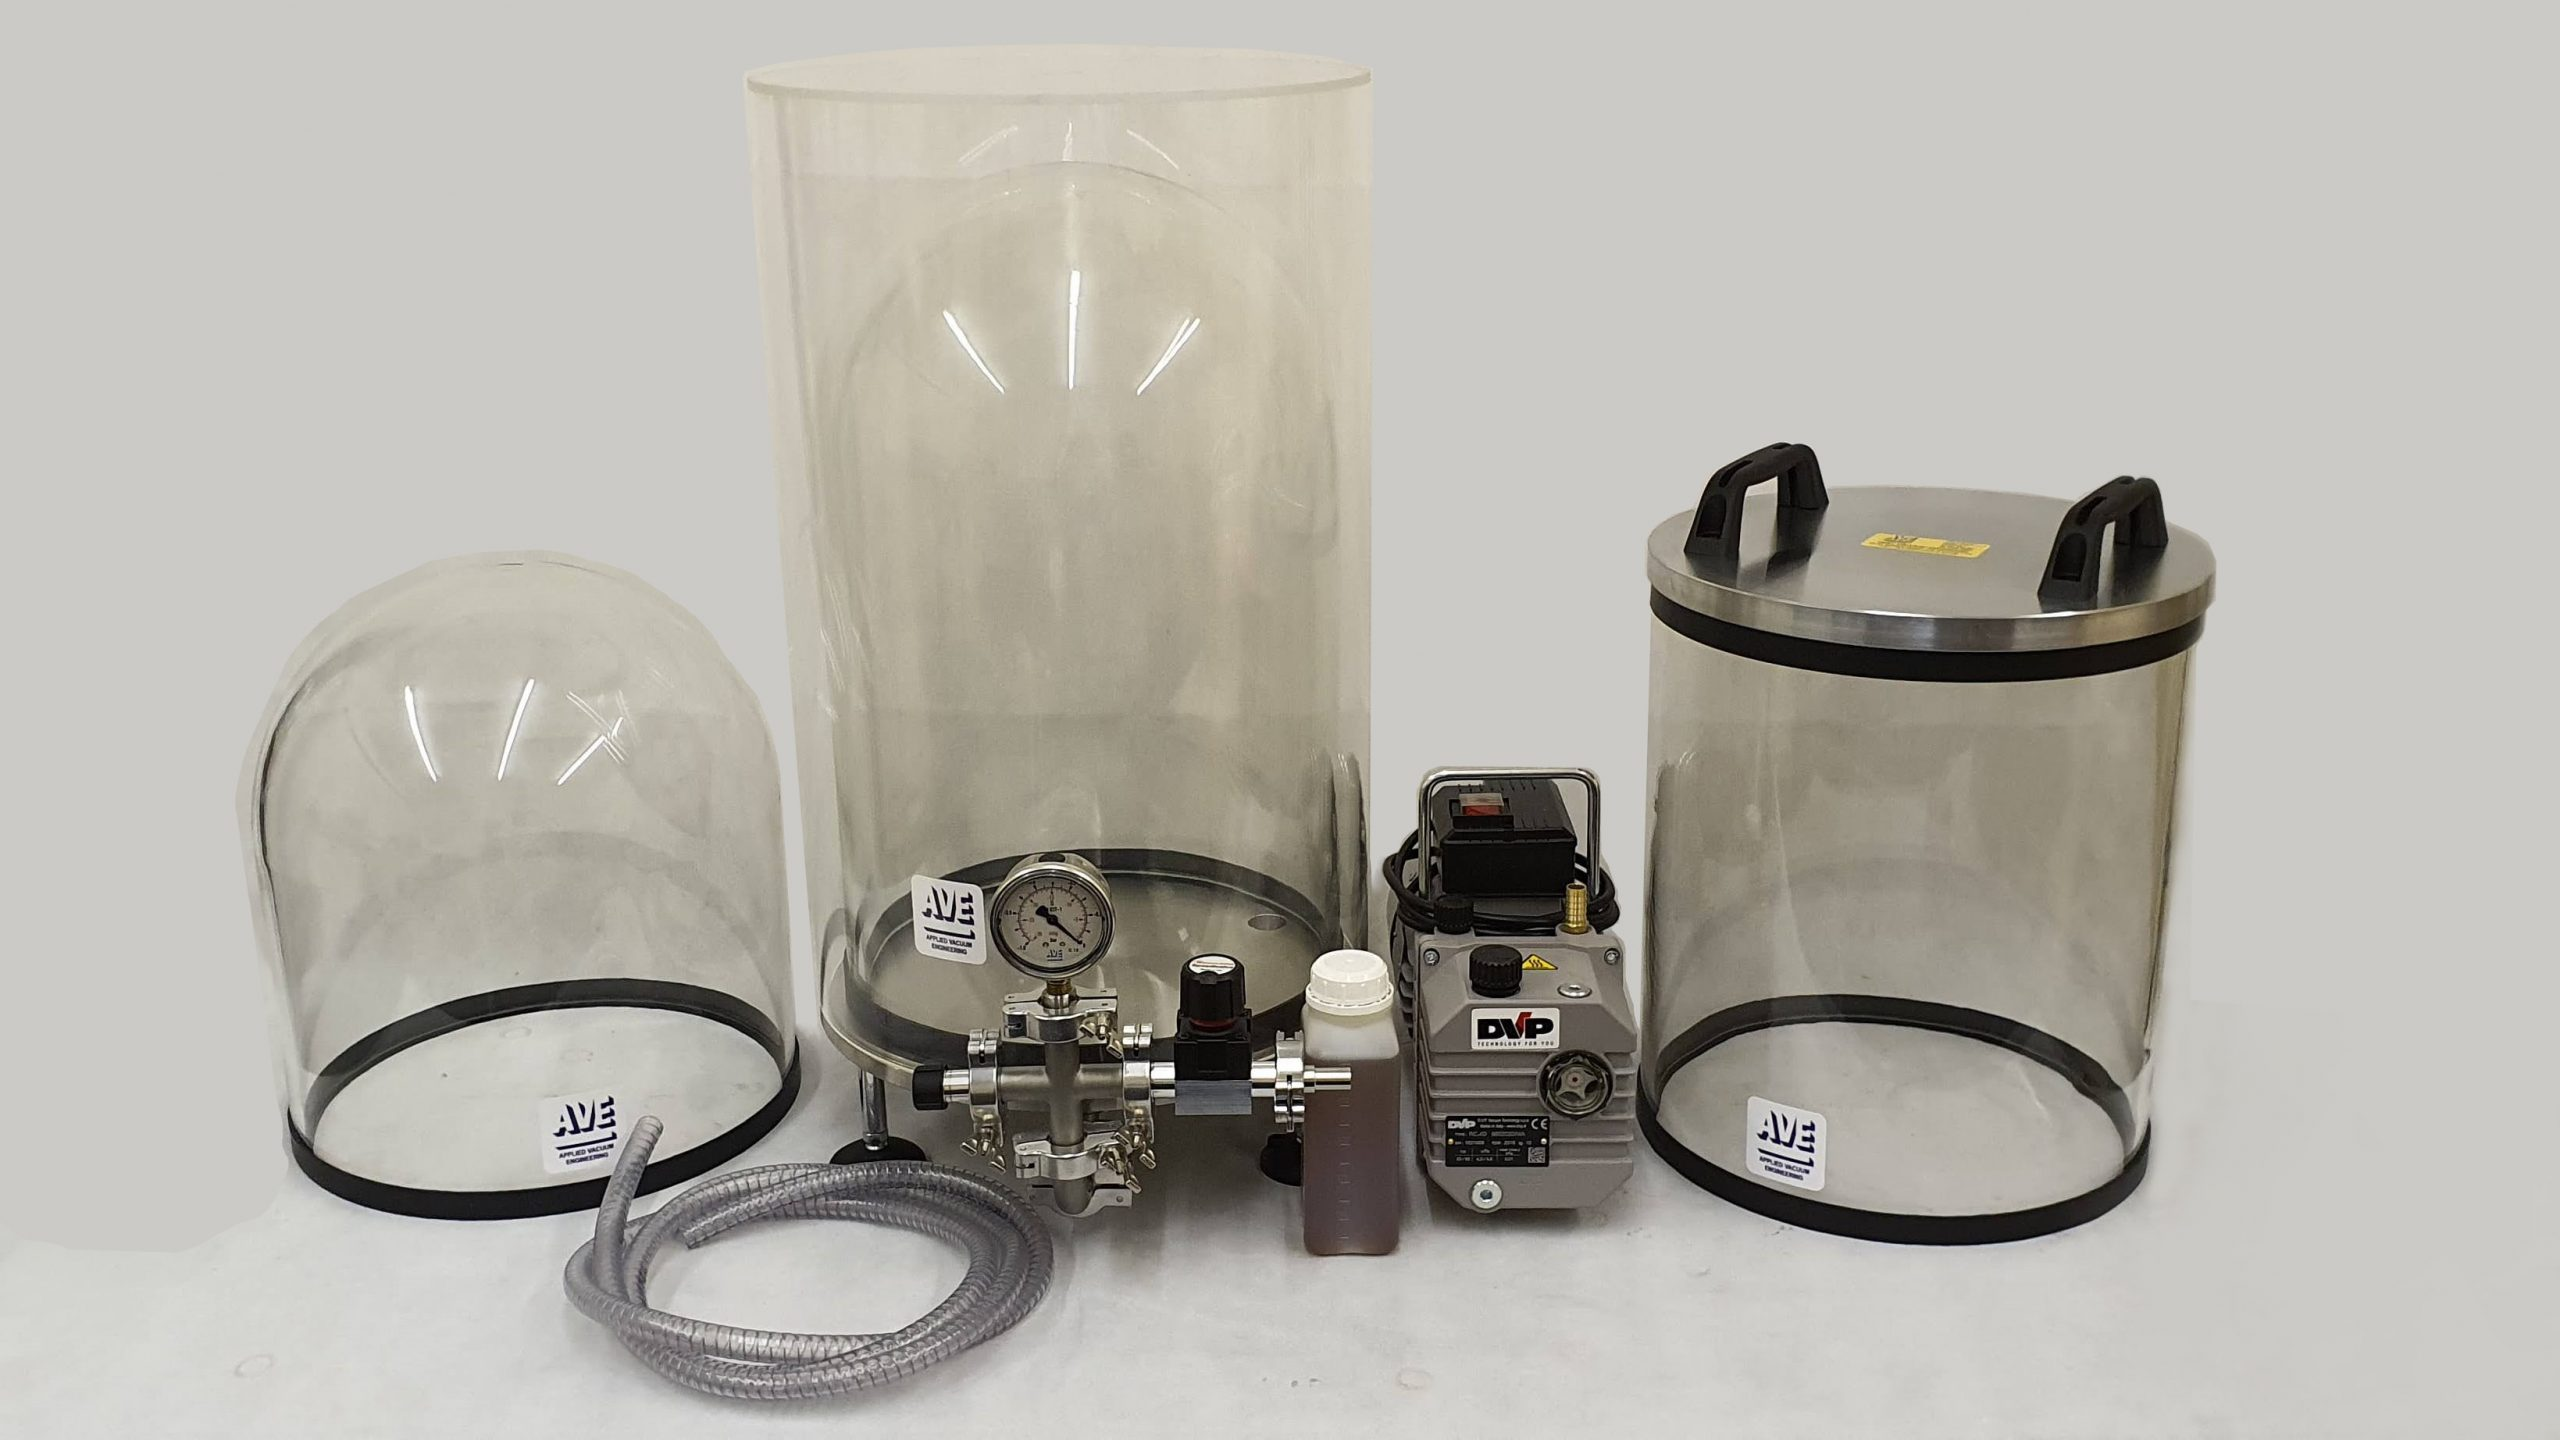 belljars and cylinders